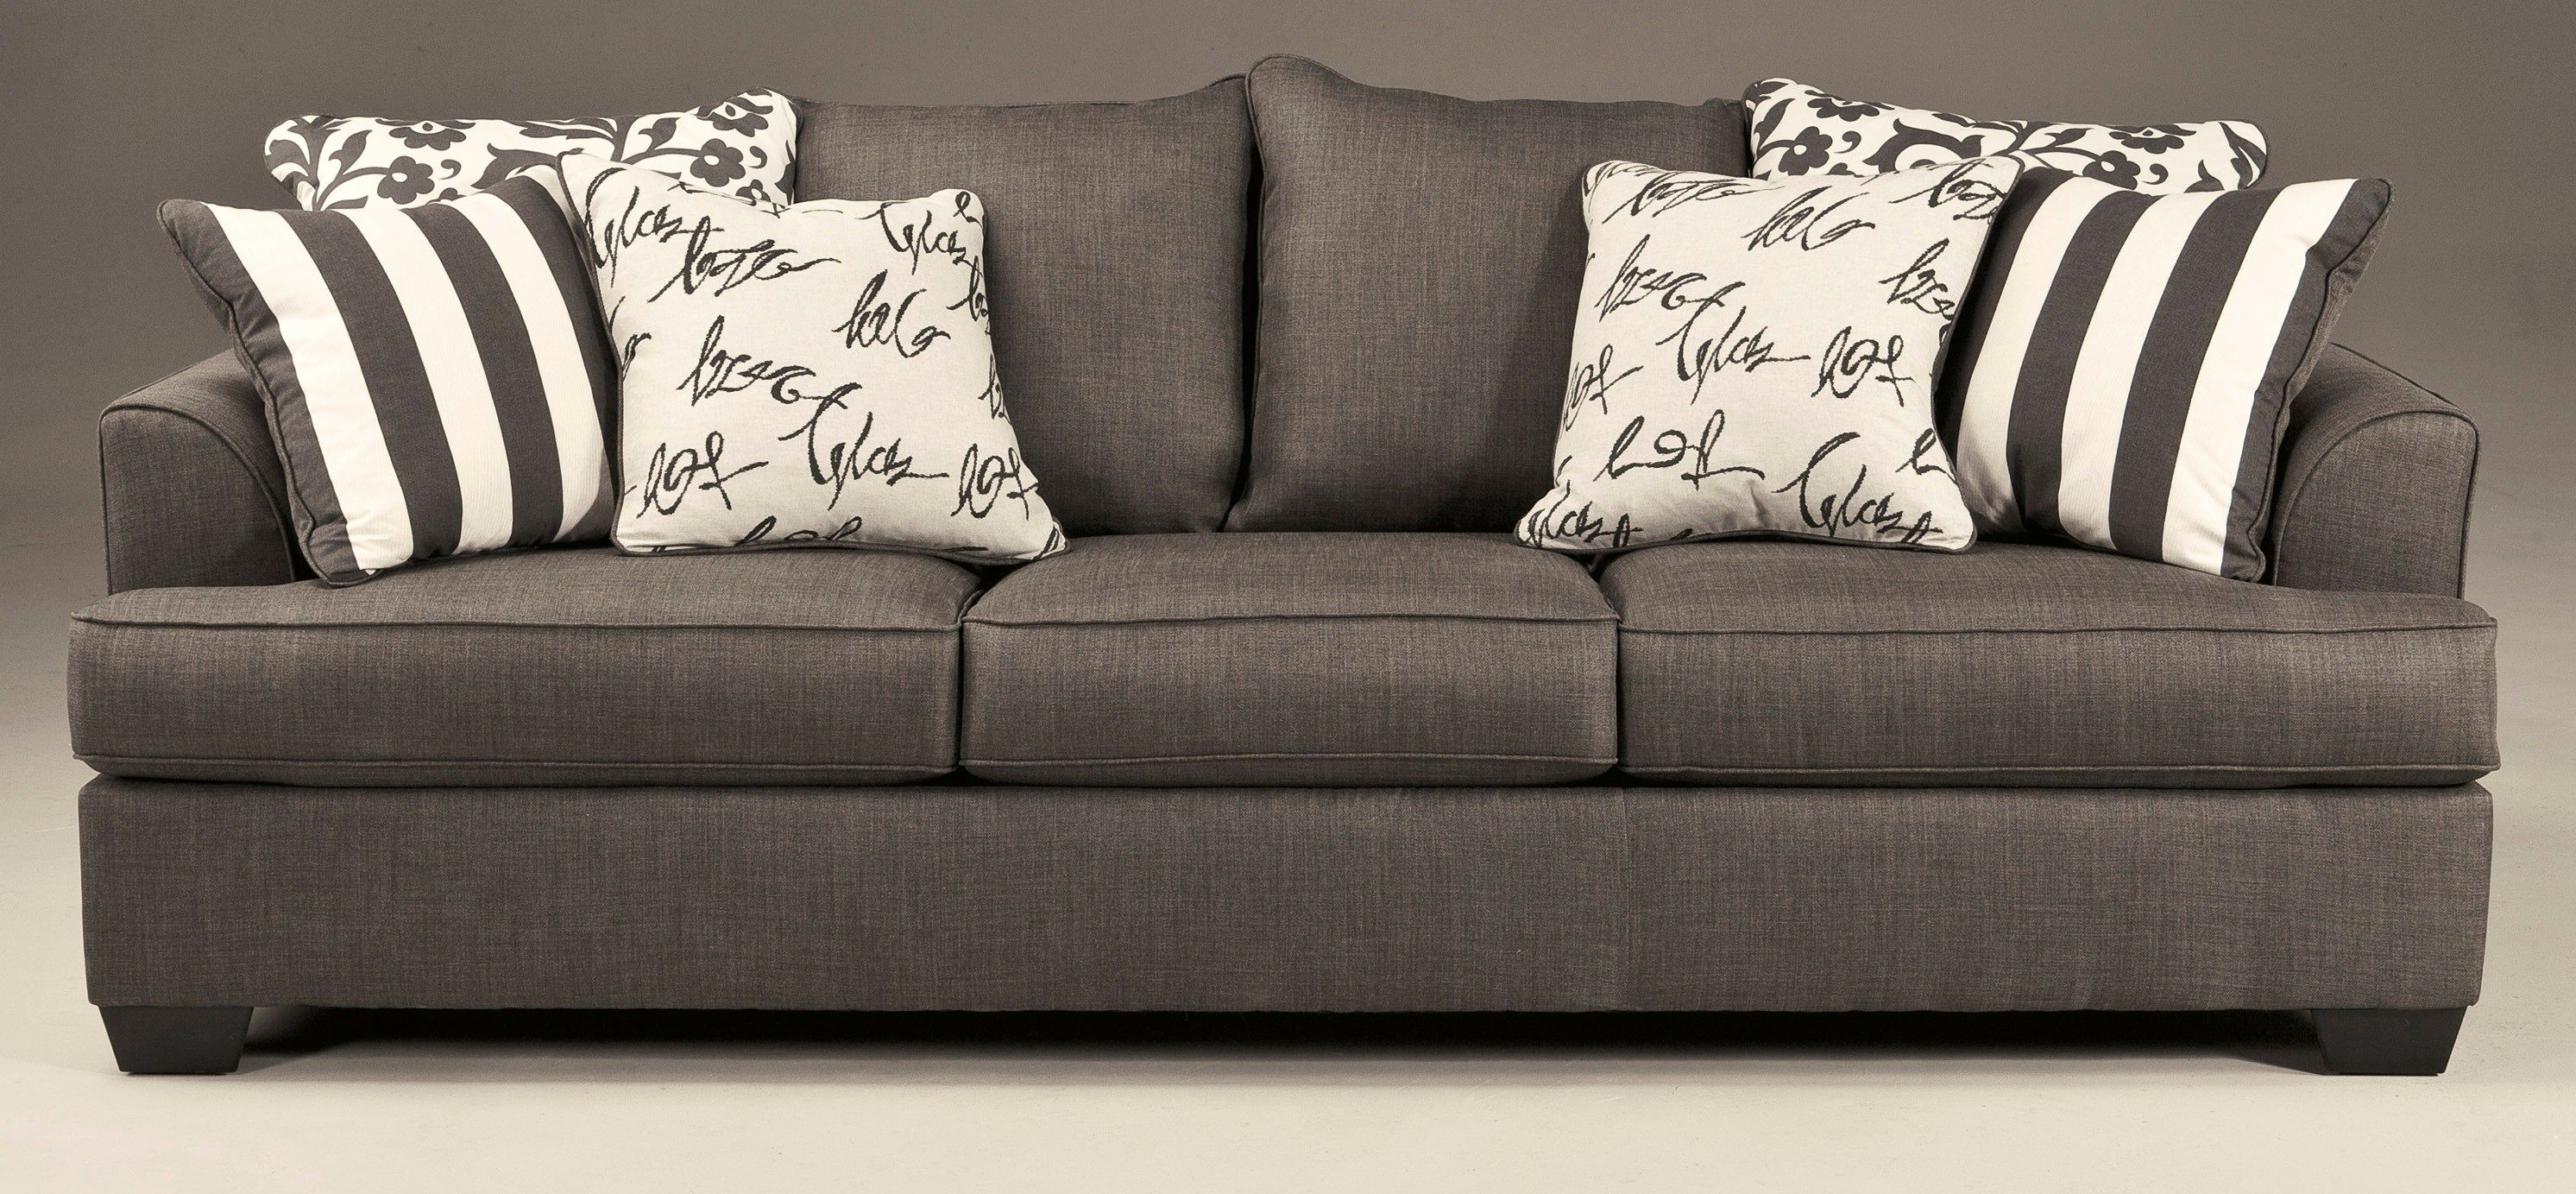 Elegant ashley Furniture sofa Sleeper Picture Ashley Furniture ...